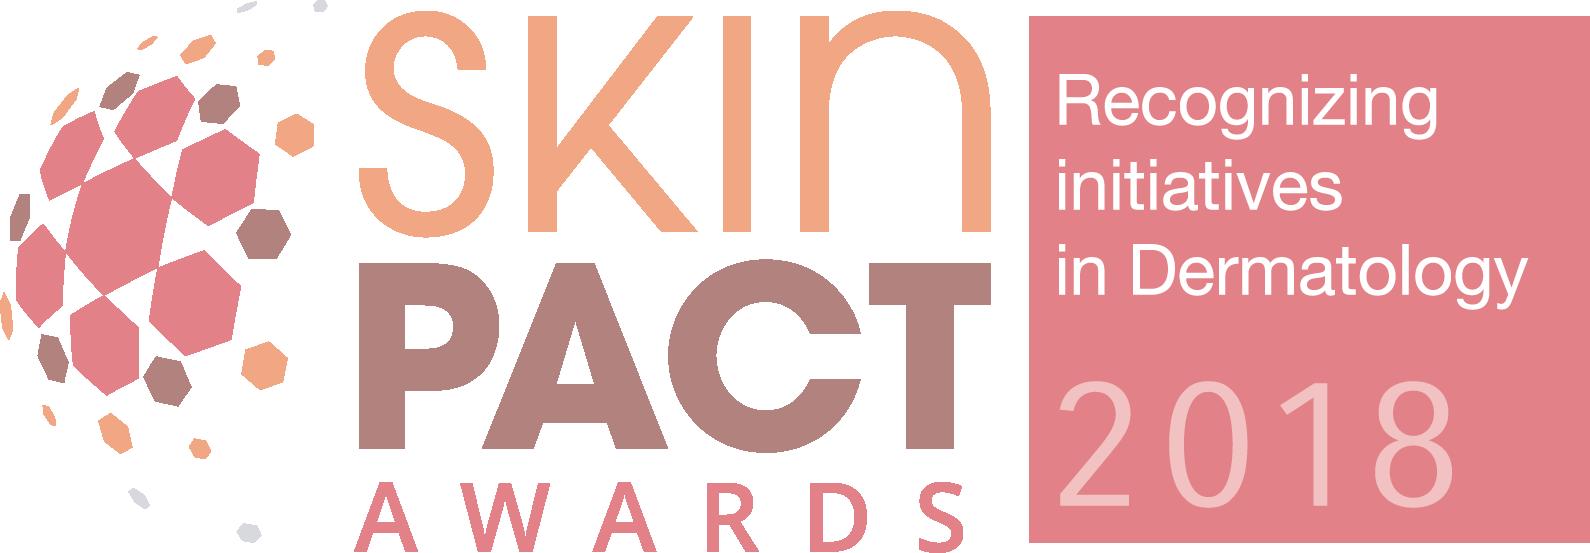 Galderma Awards Logo 2018